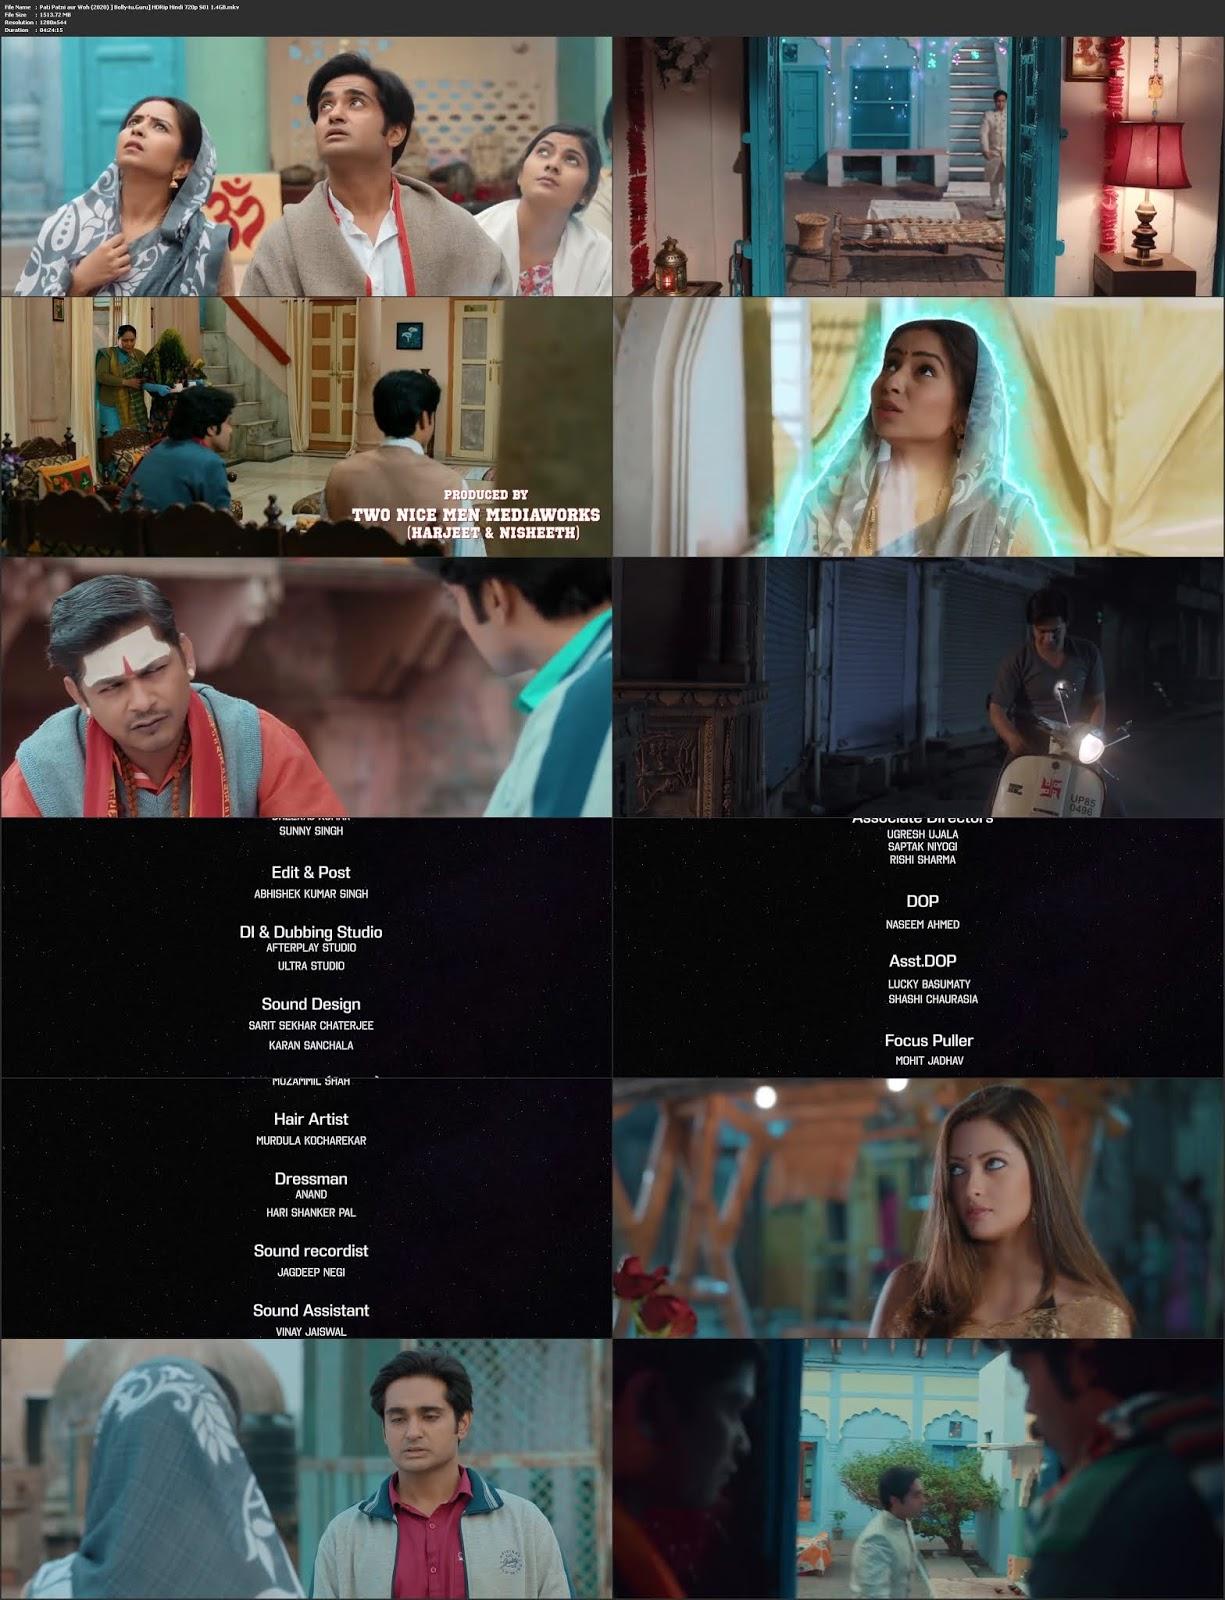 Pati Patni aur Woh 2020 HDRip 1.4GB Hindi S01 Complete Download 720p